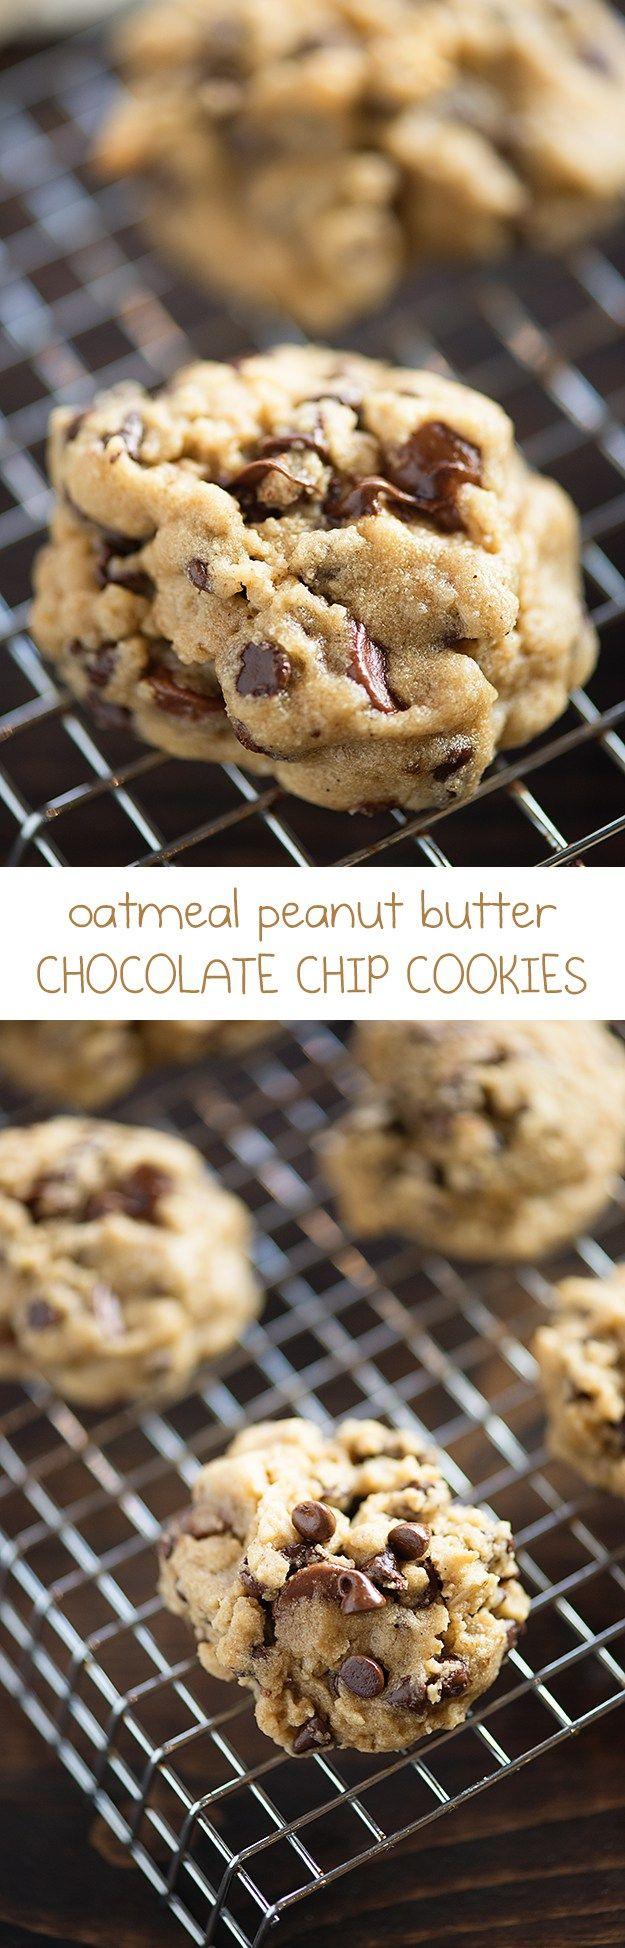 25+ best ideas about Oatmeal peanut butter cookies on Pinterest ...